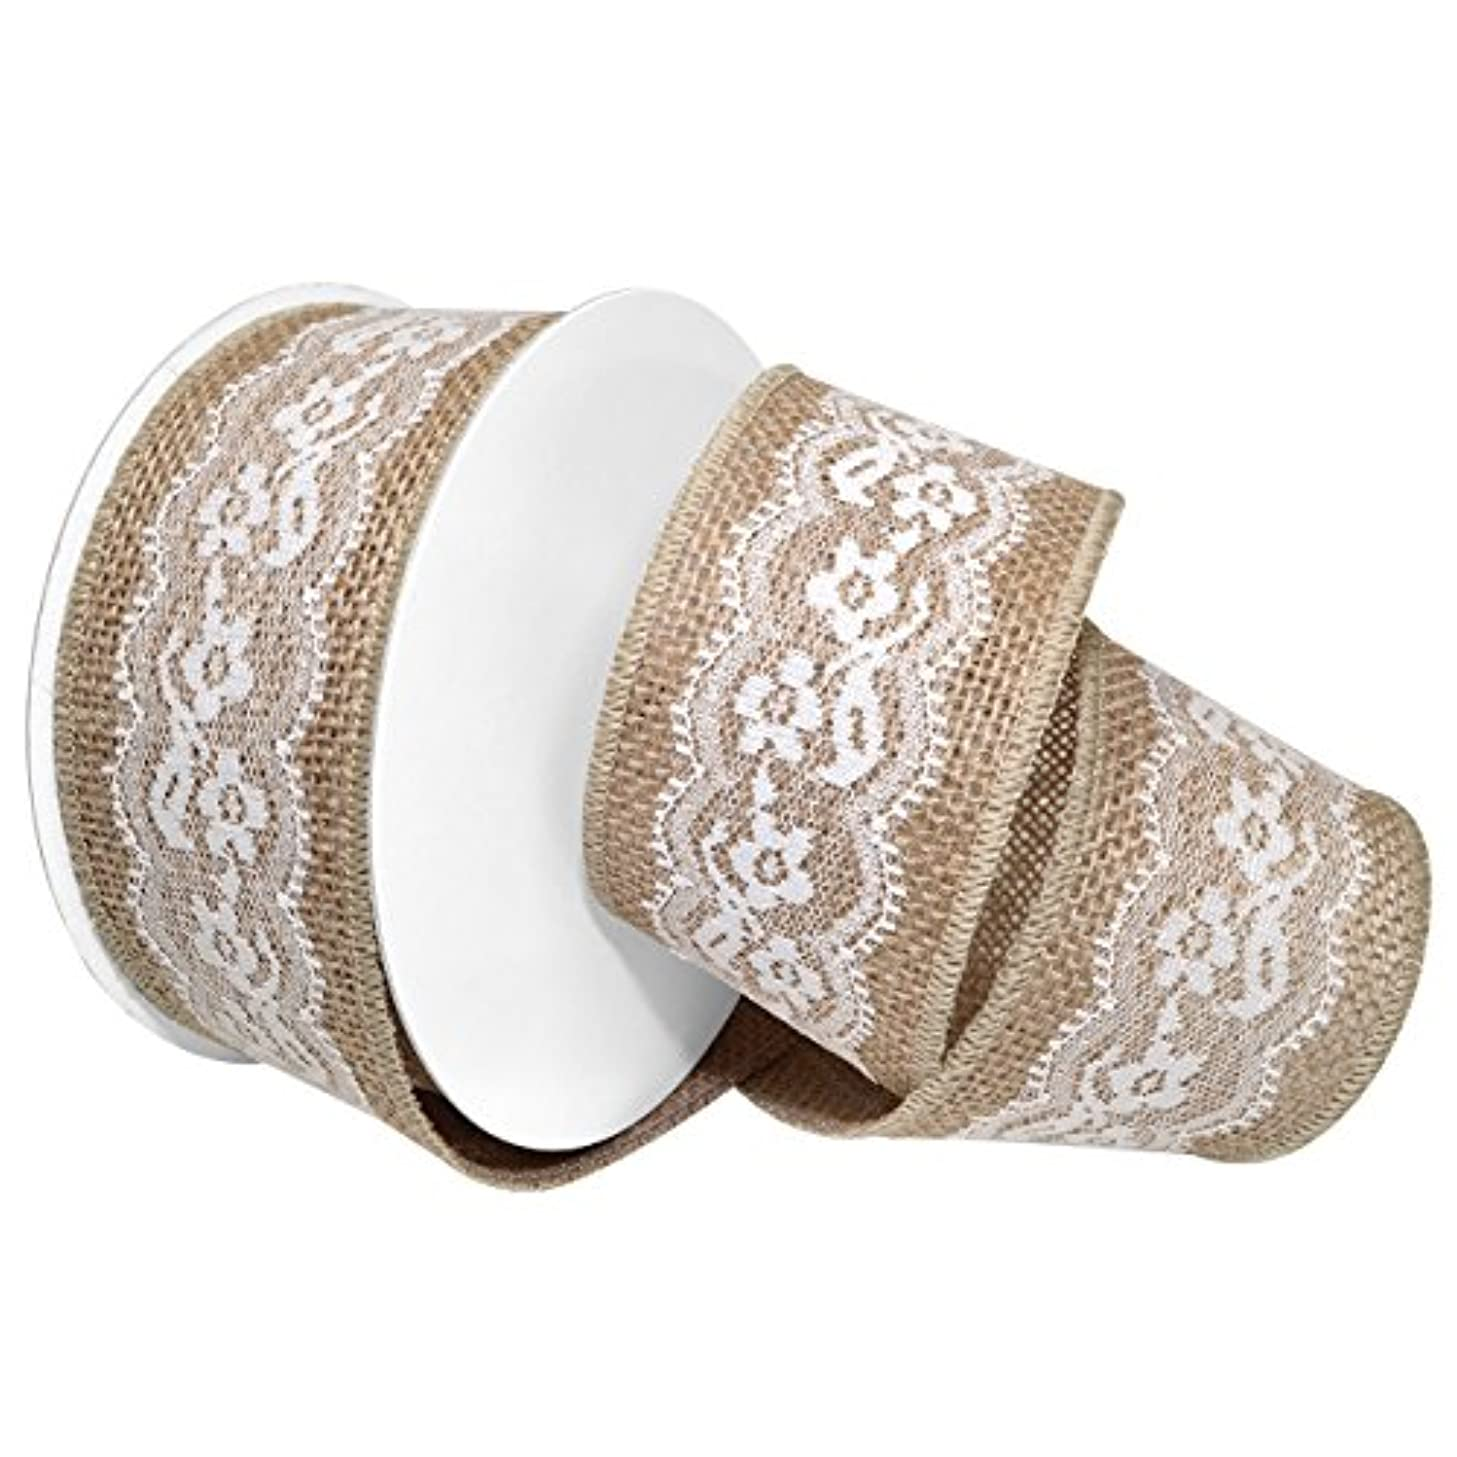 Morex Ribbon Wired Jute Seville Lace Ribbon, 2-1/2